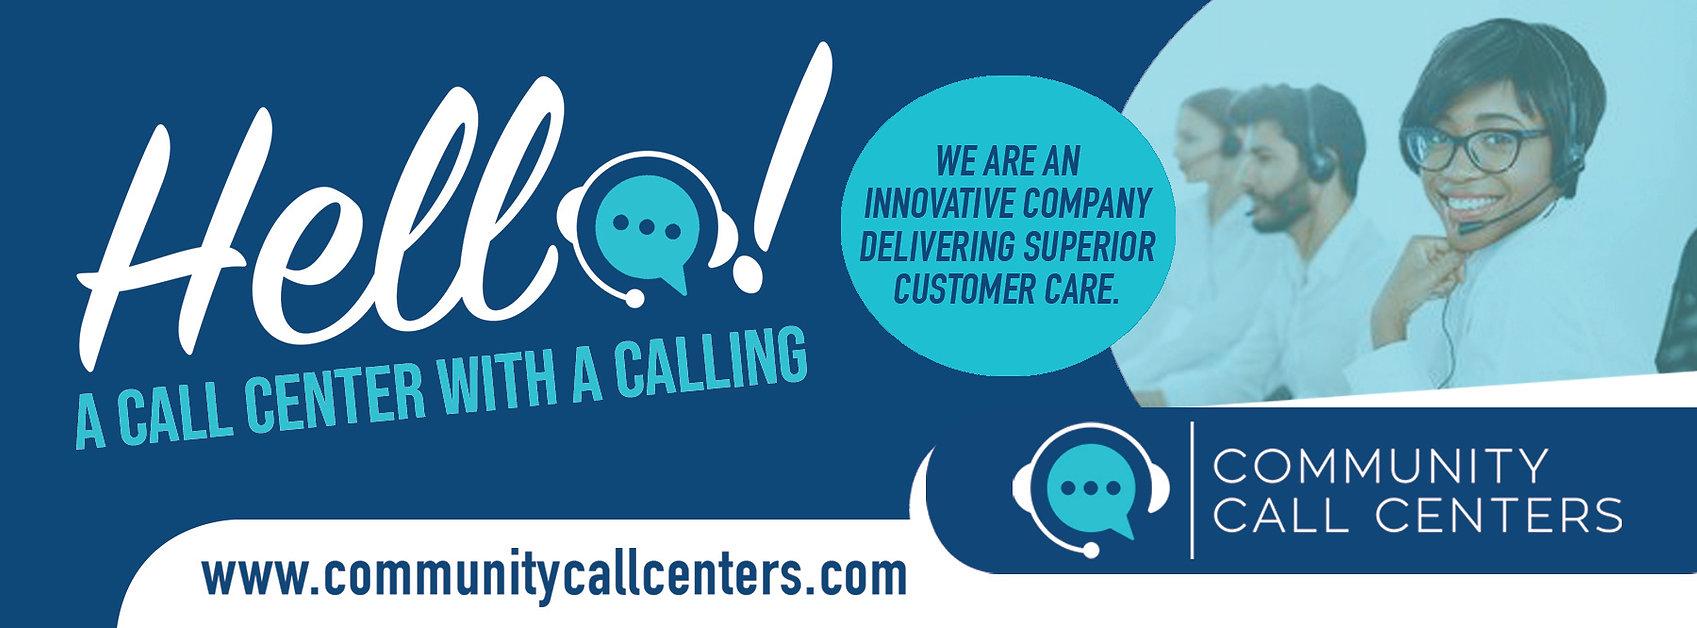 CALL CENTER FACEBOOK HEADER.jpg